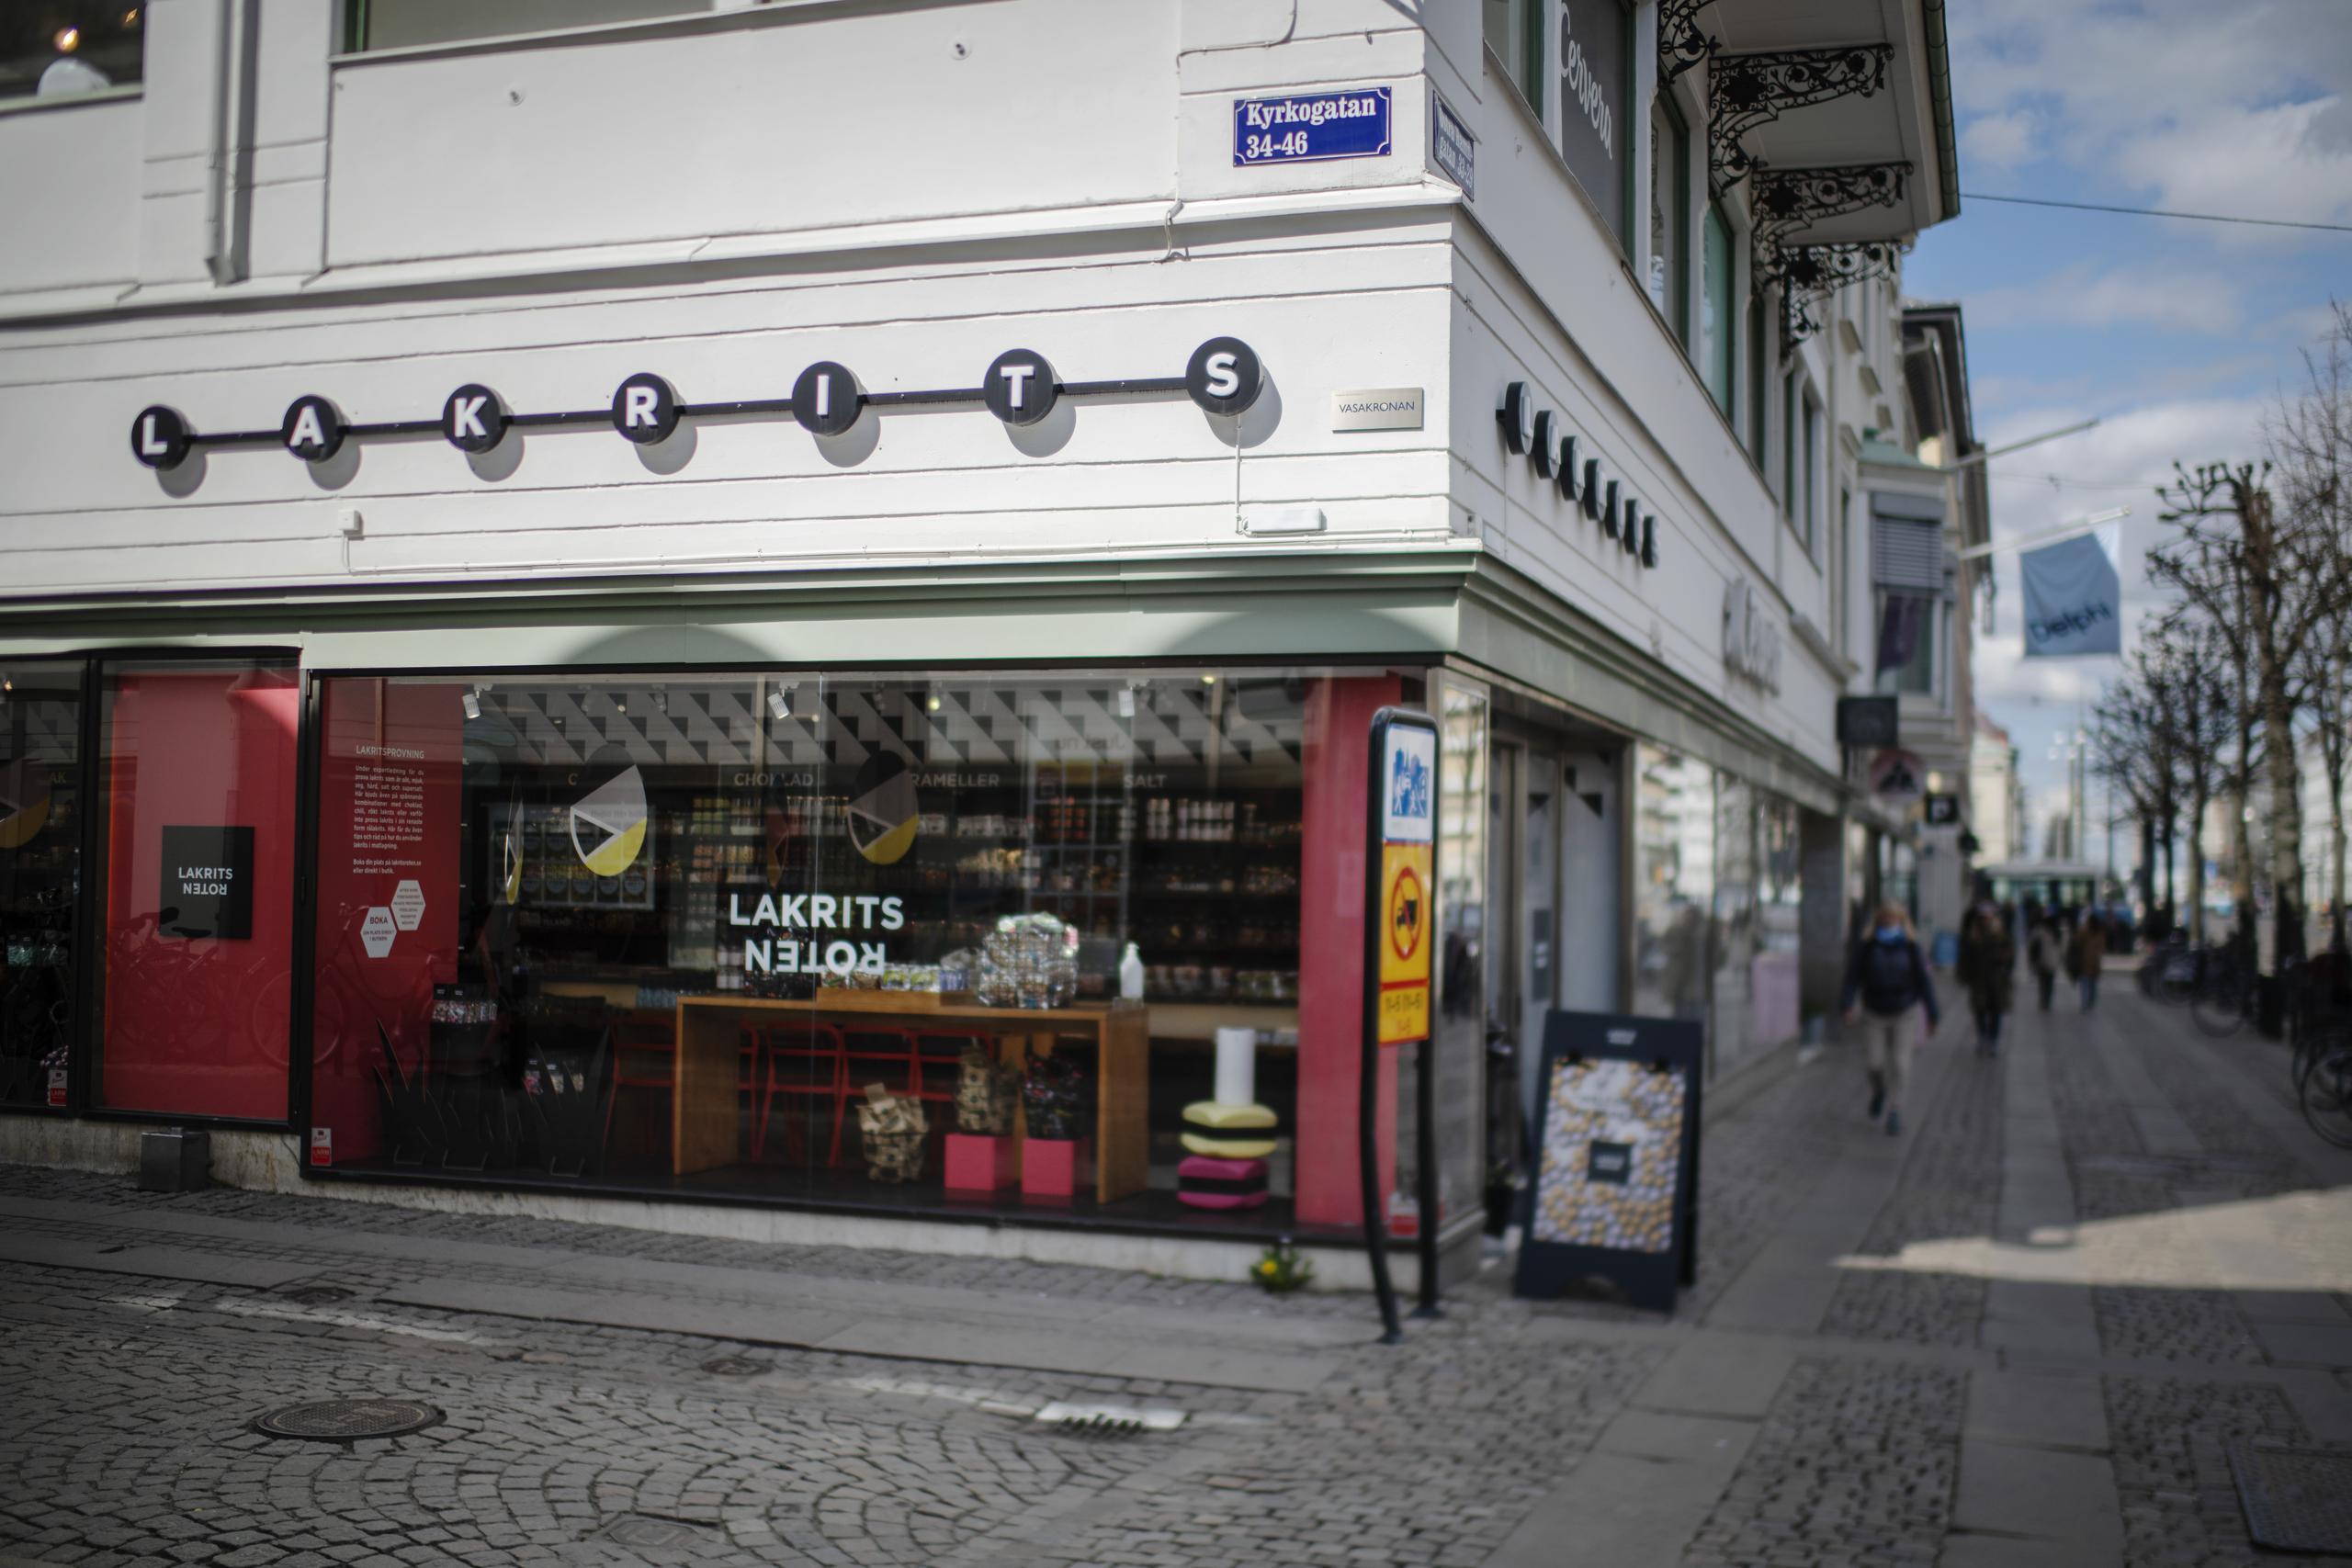 Godiskedjan i kris - har två butiker i Göteborg